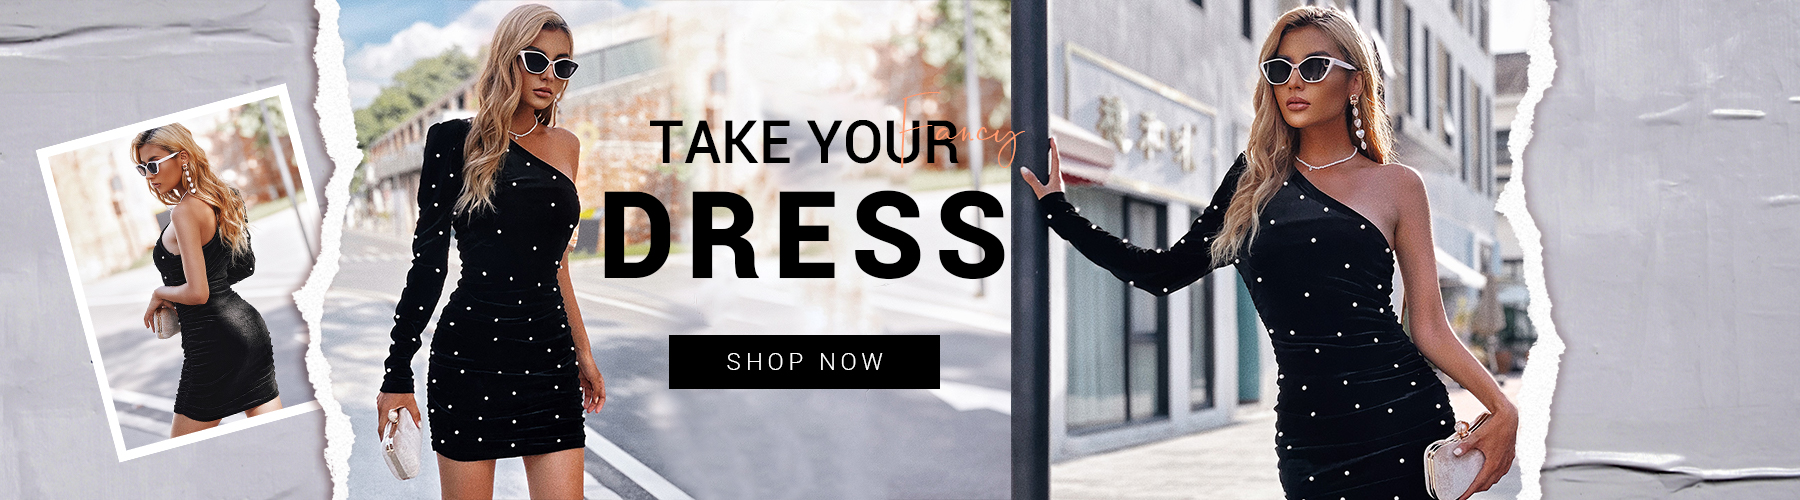 Take Your Fancy Dress